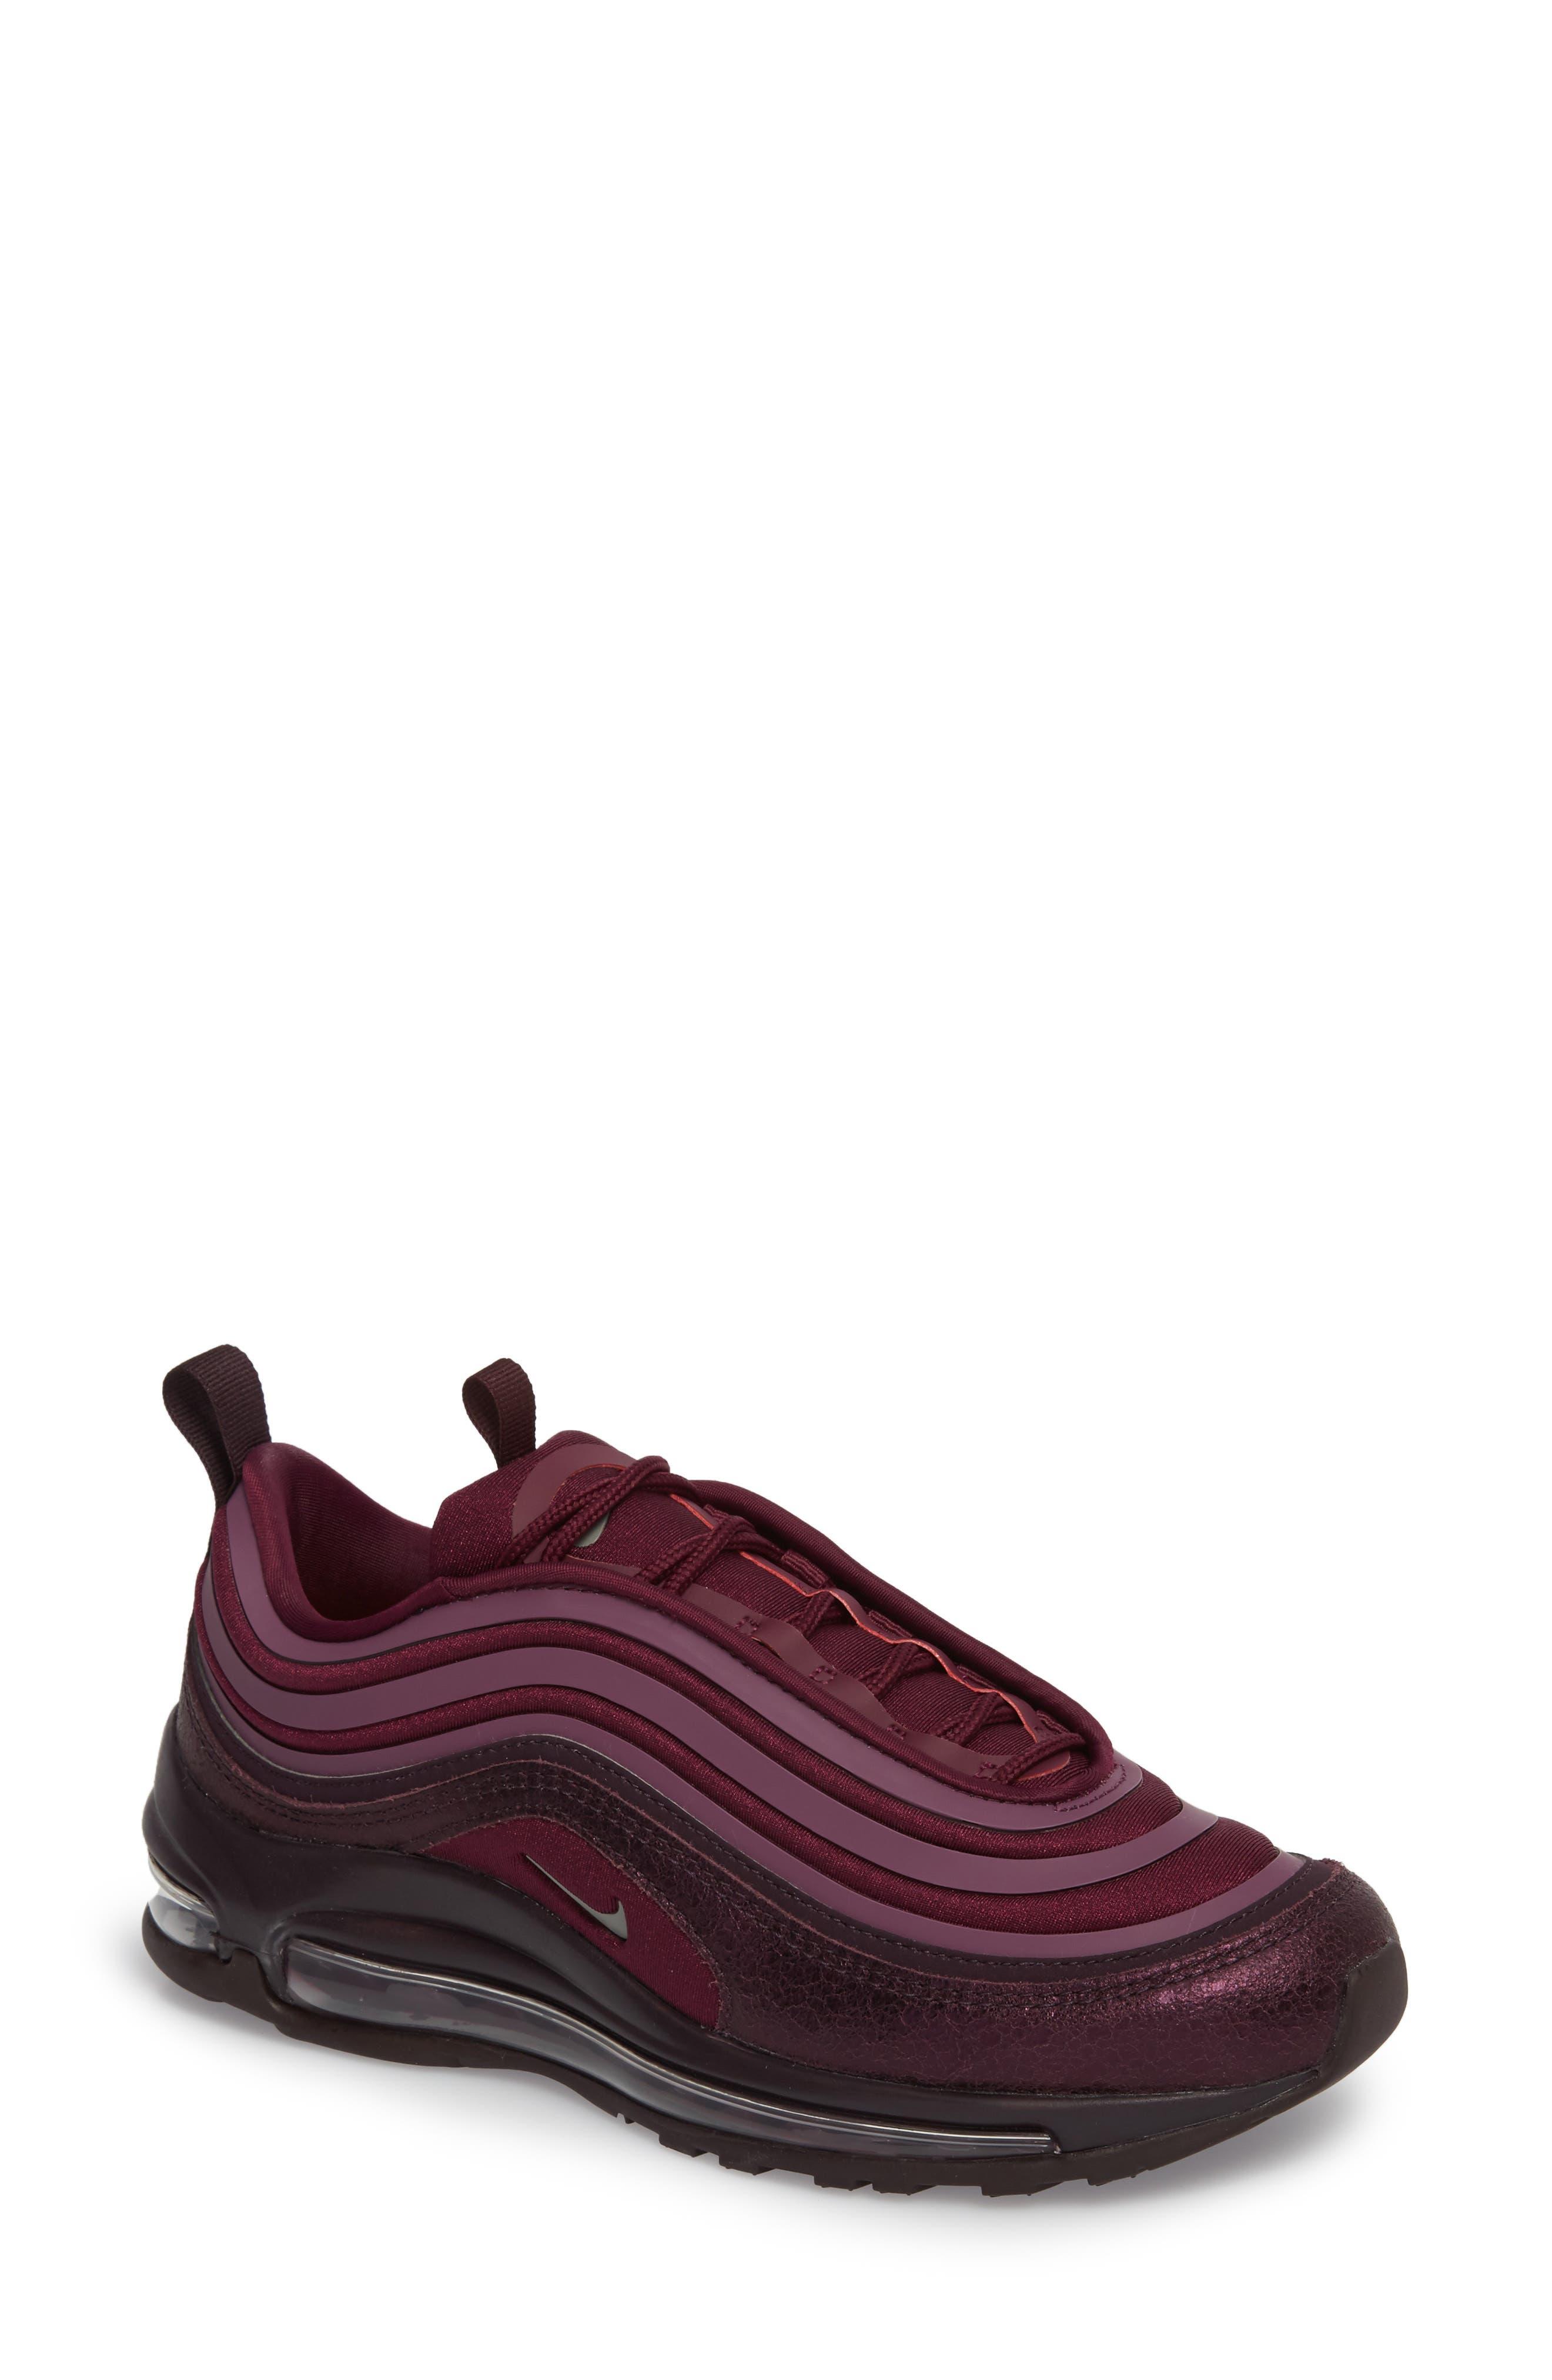 Air Max 97 Ultra '17 SE Sneaker,                             Main thumbnail 9, color,